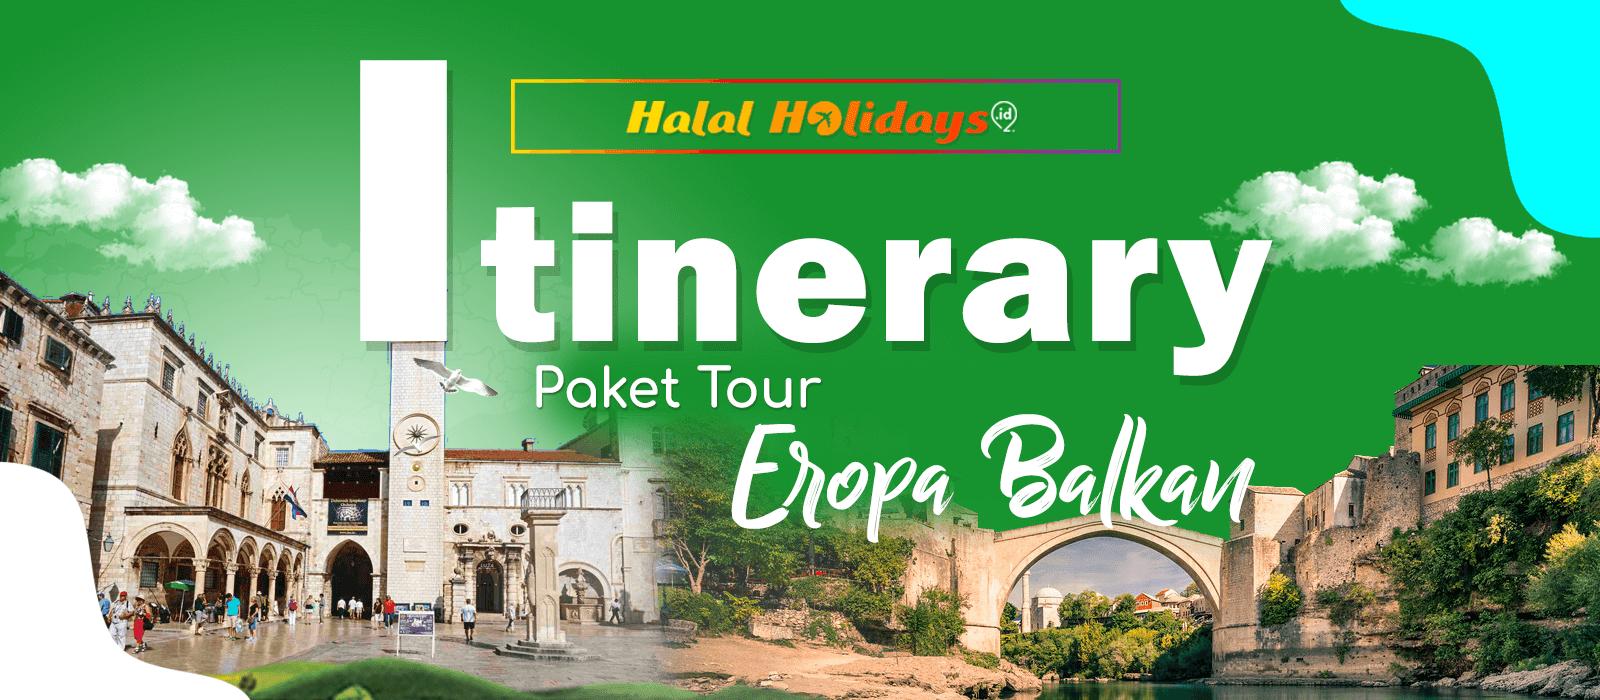 Itinerary Paket Tour Halal Eropa Balkan 10 Hari